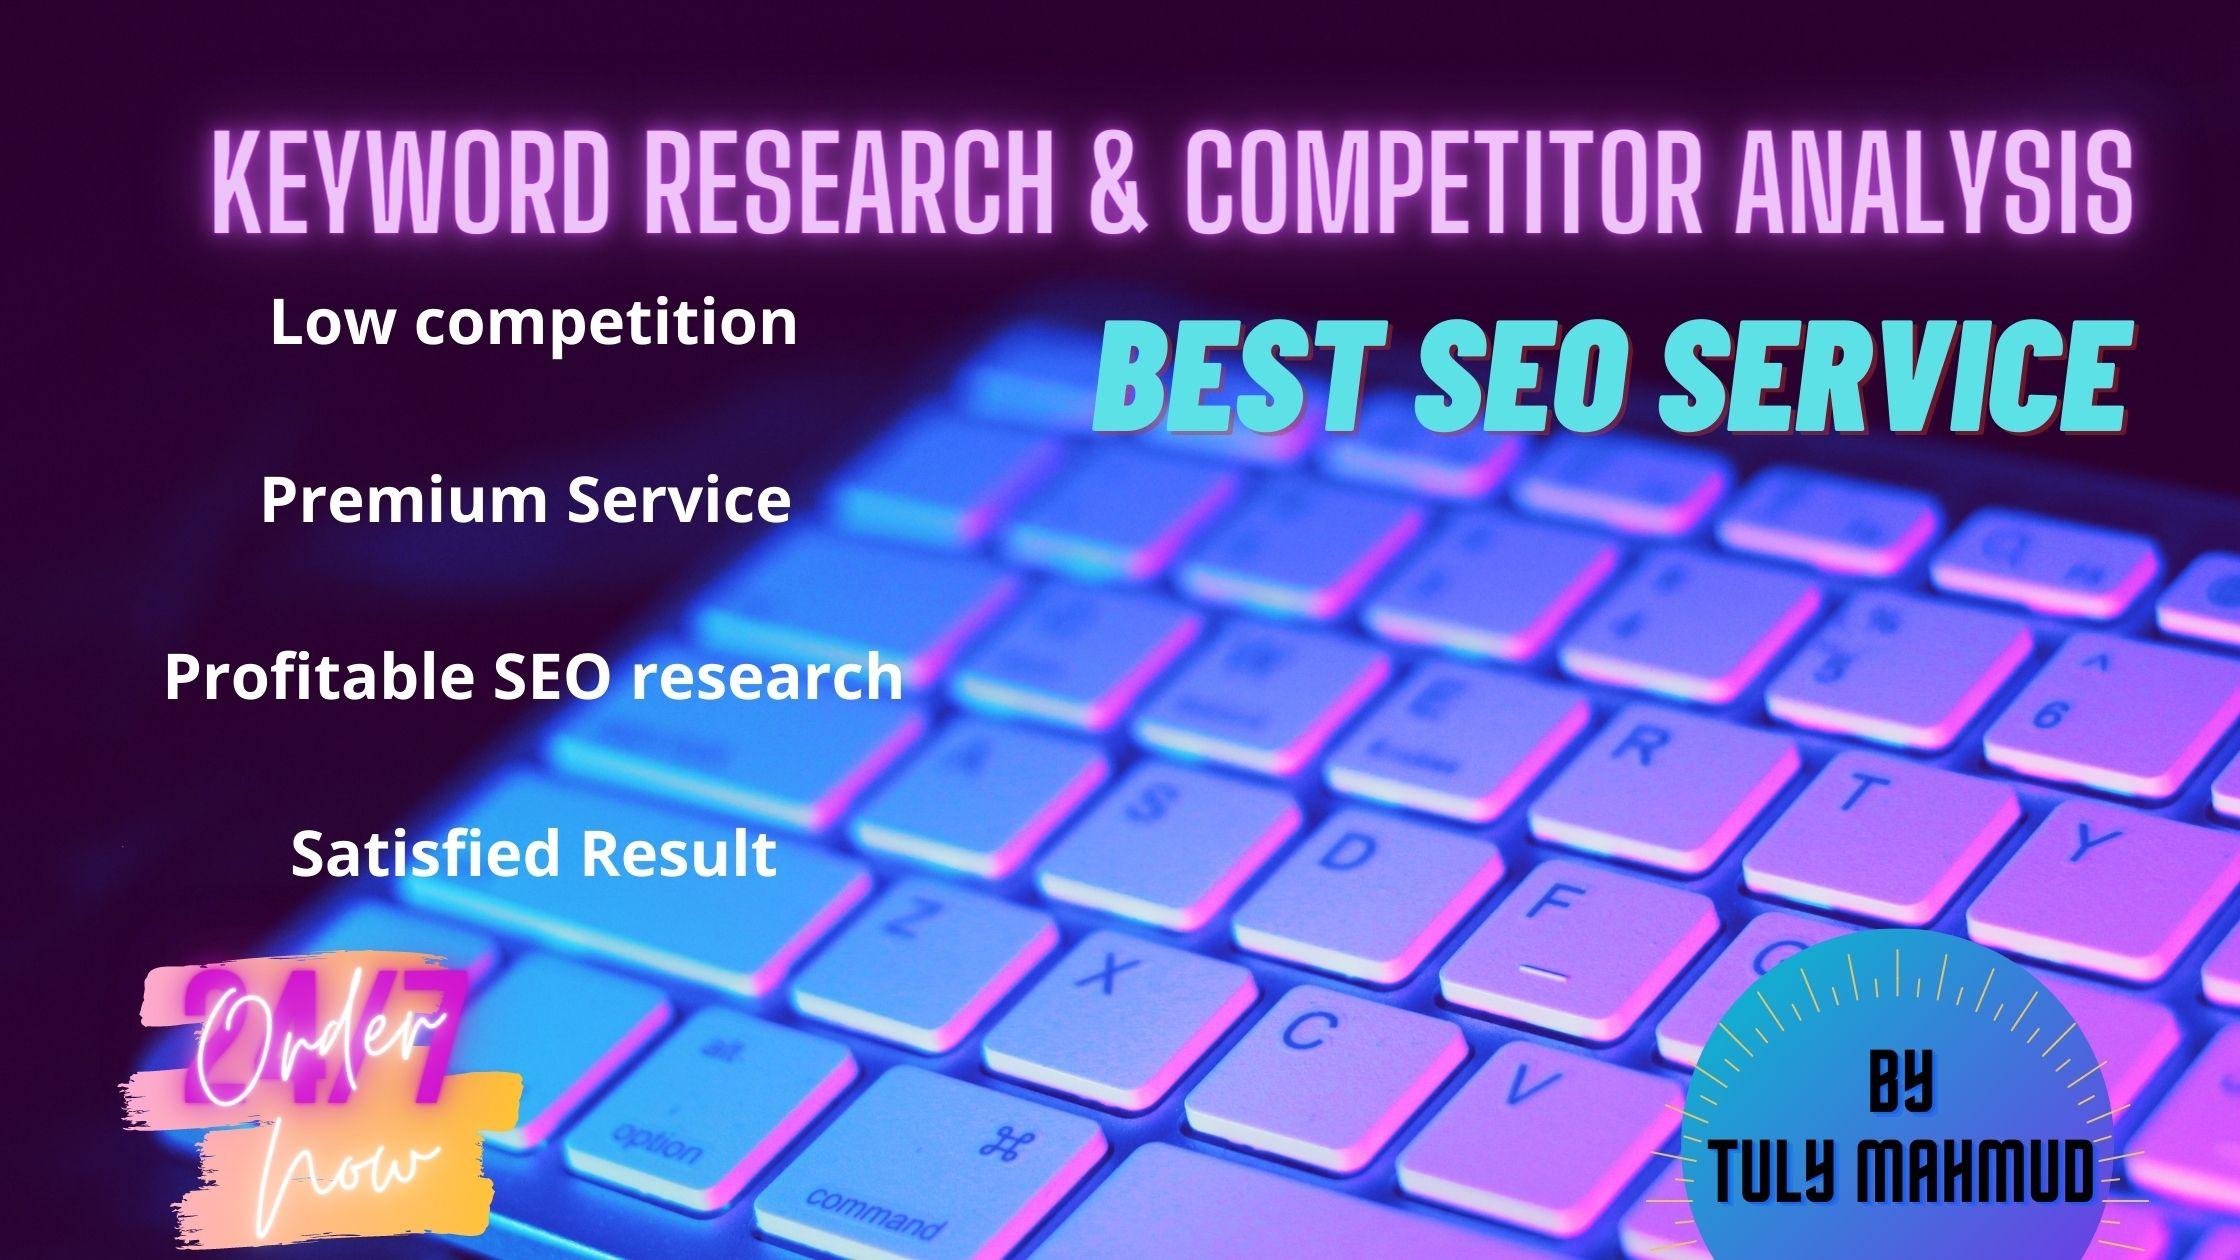 SEO & Keyword research & compititator analysis